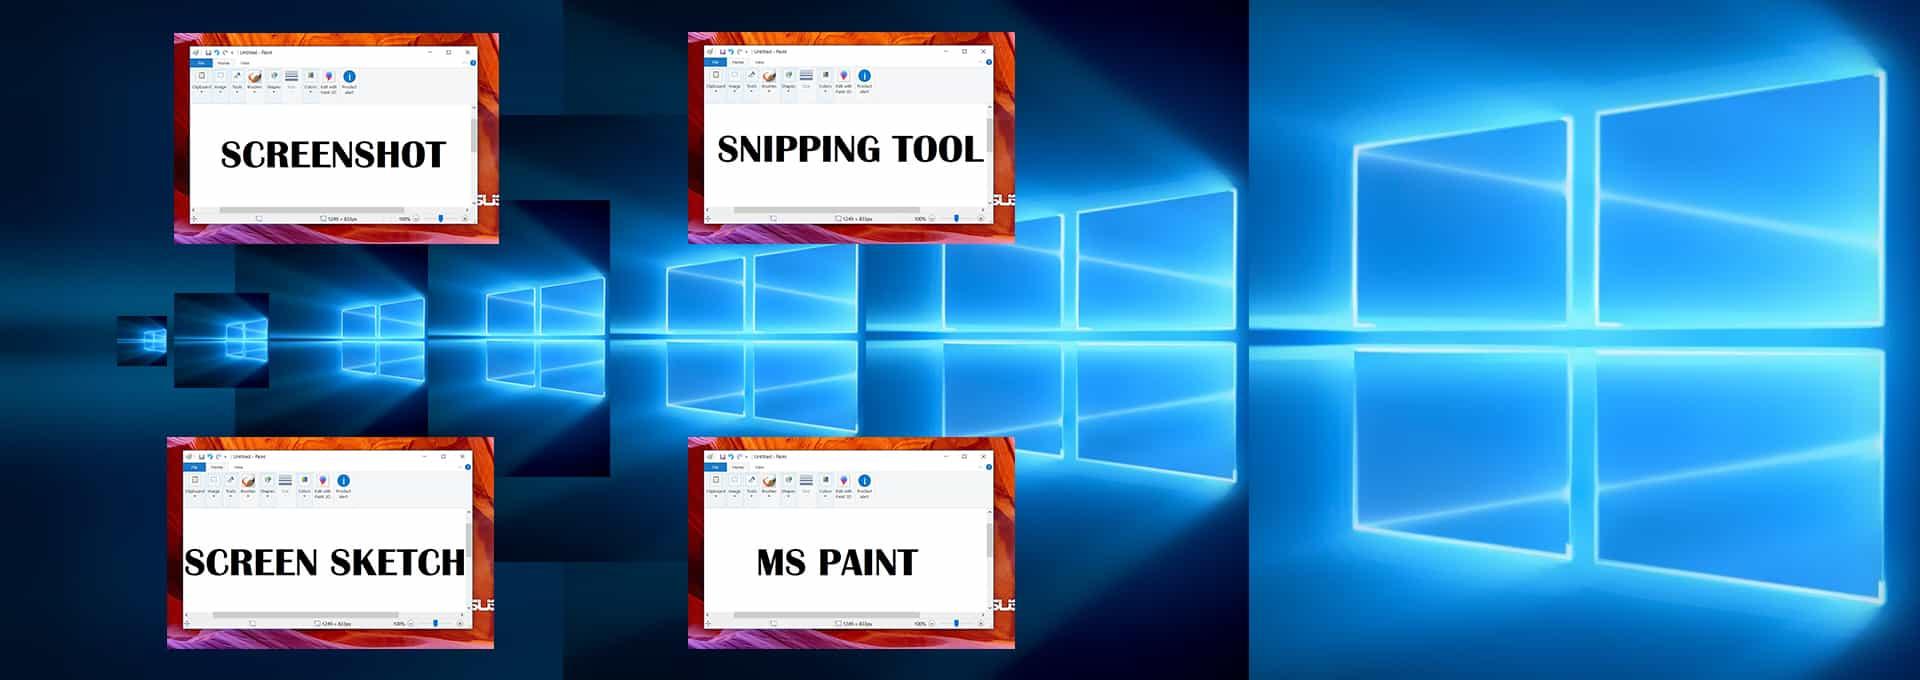 how to take a screenshot on windows hp